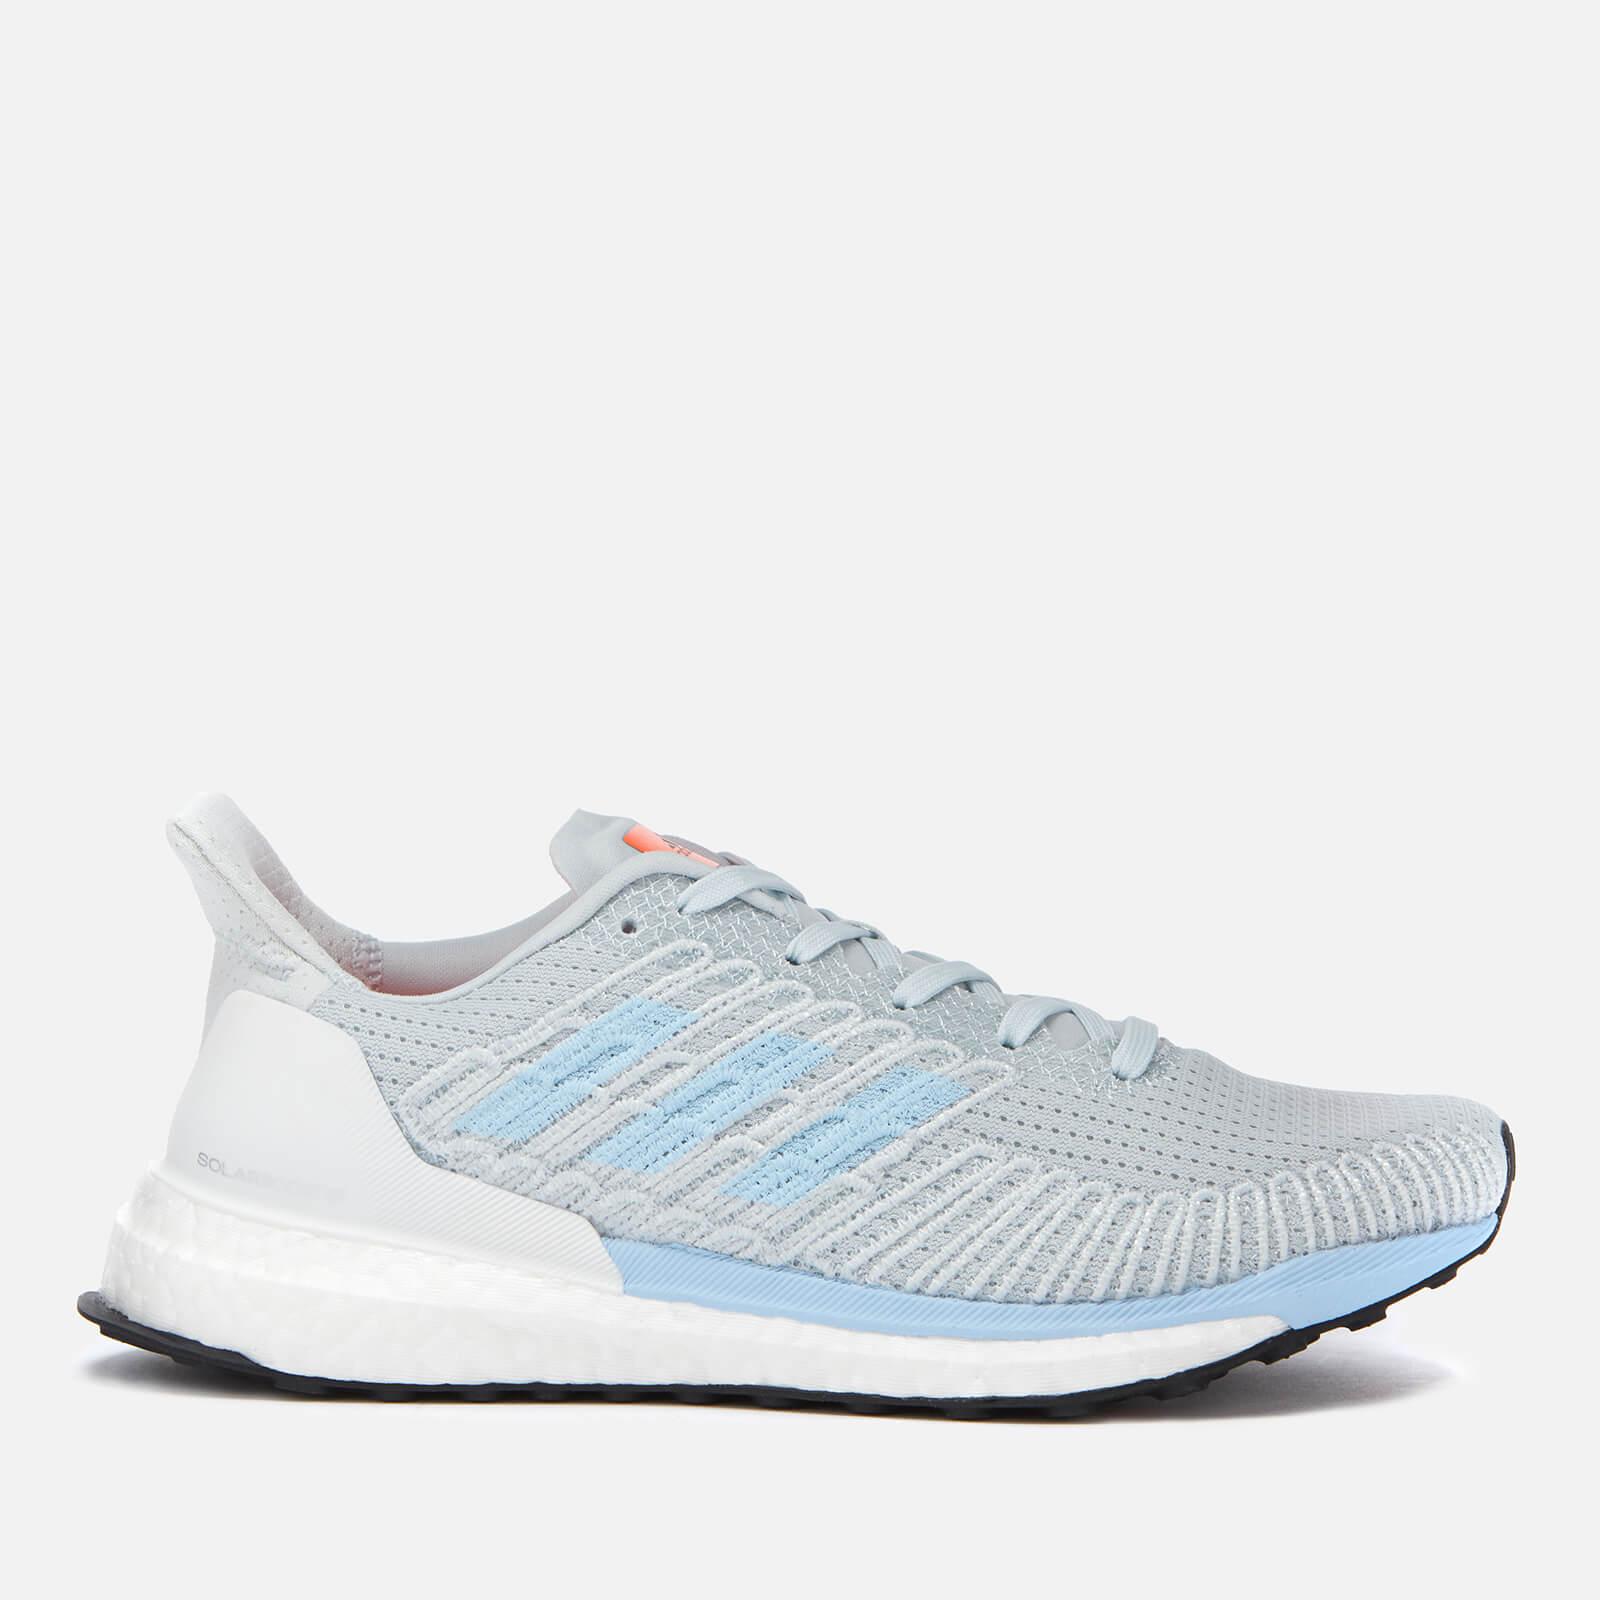 adidas Women's Solar Boost St Trainers - Blue - UK 7 - Blue